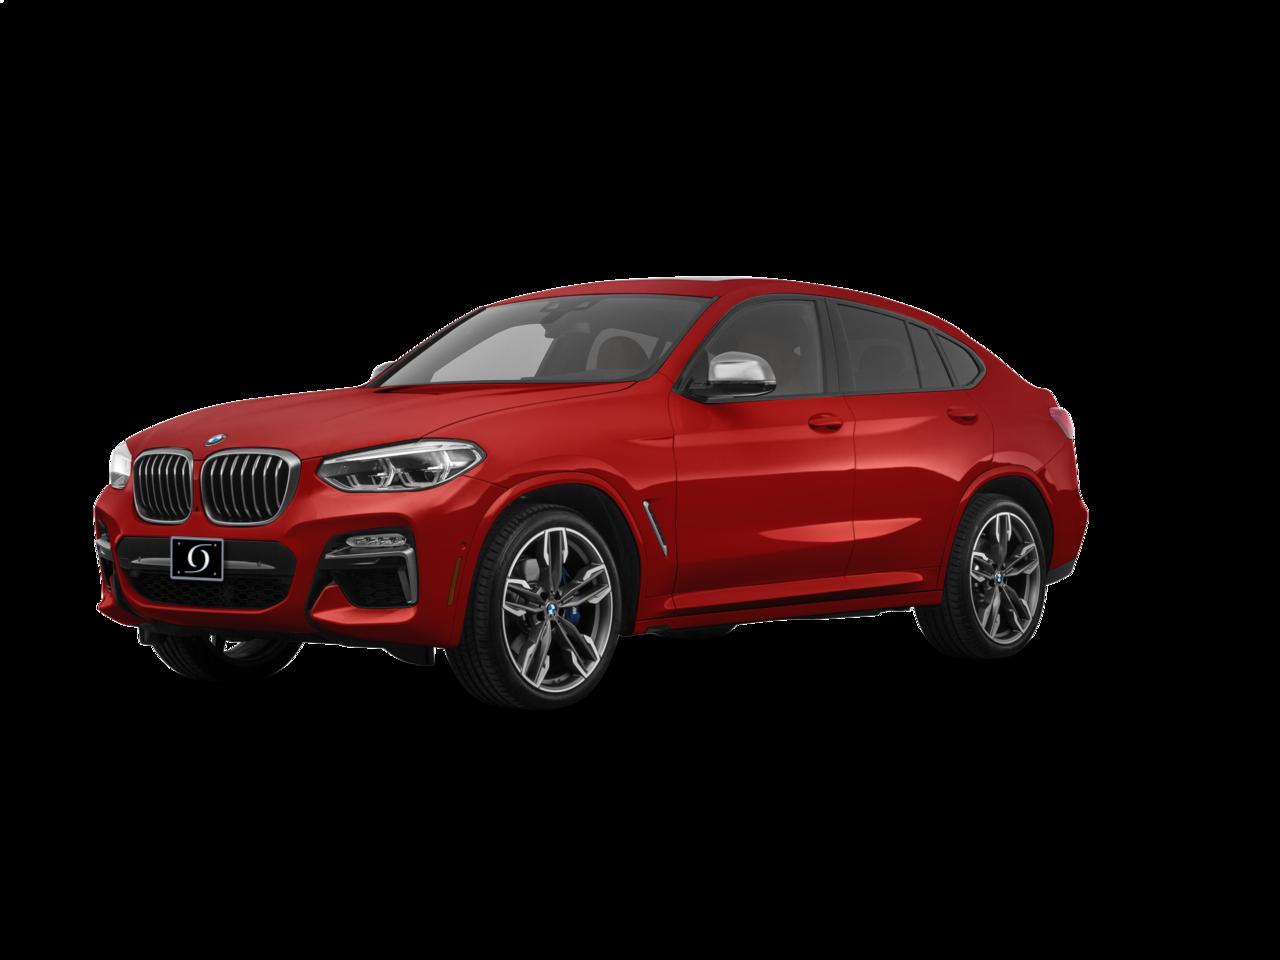 2021 BMW X4 M40i Lease Deal | Omega Auto Group